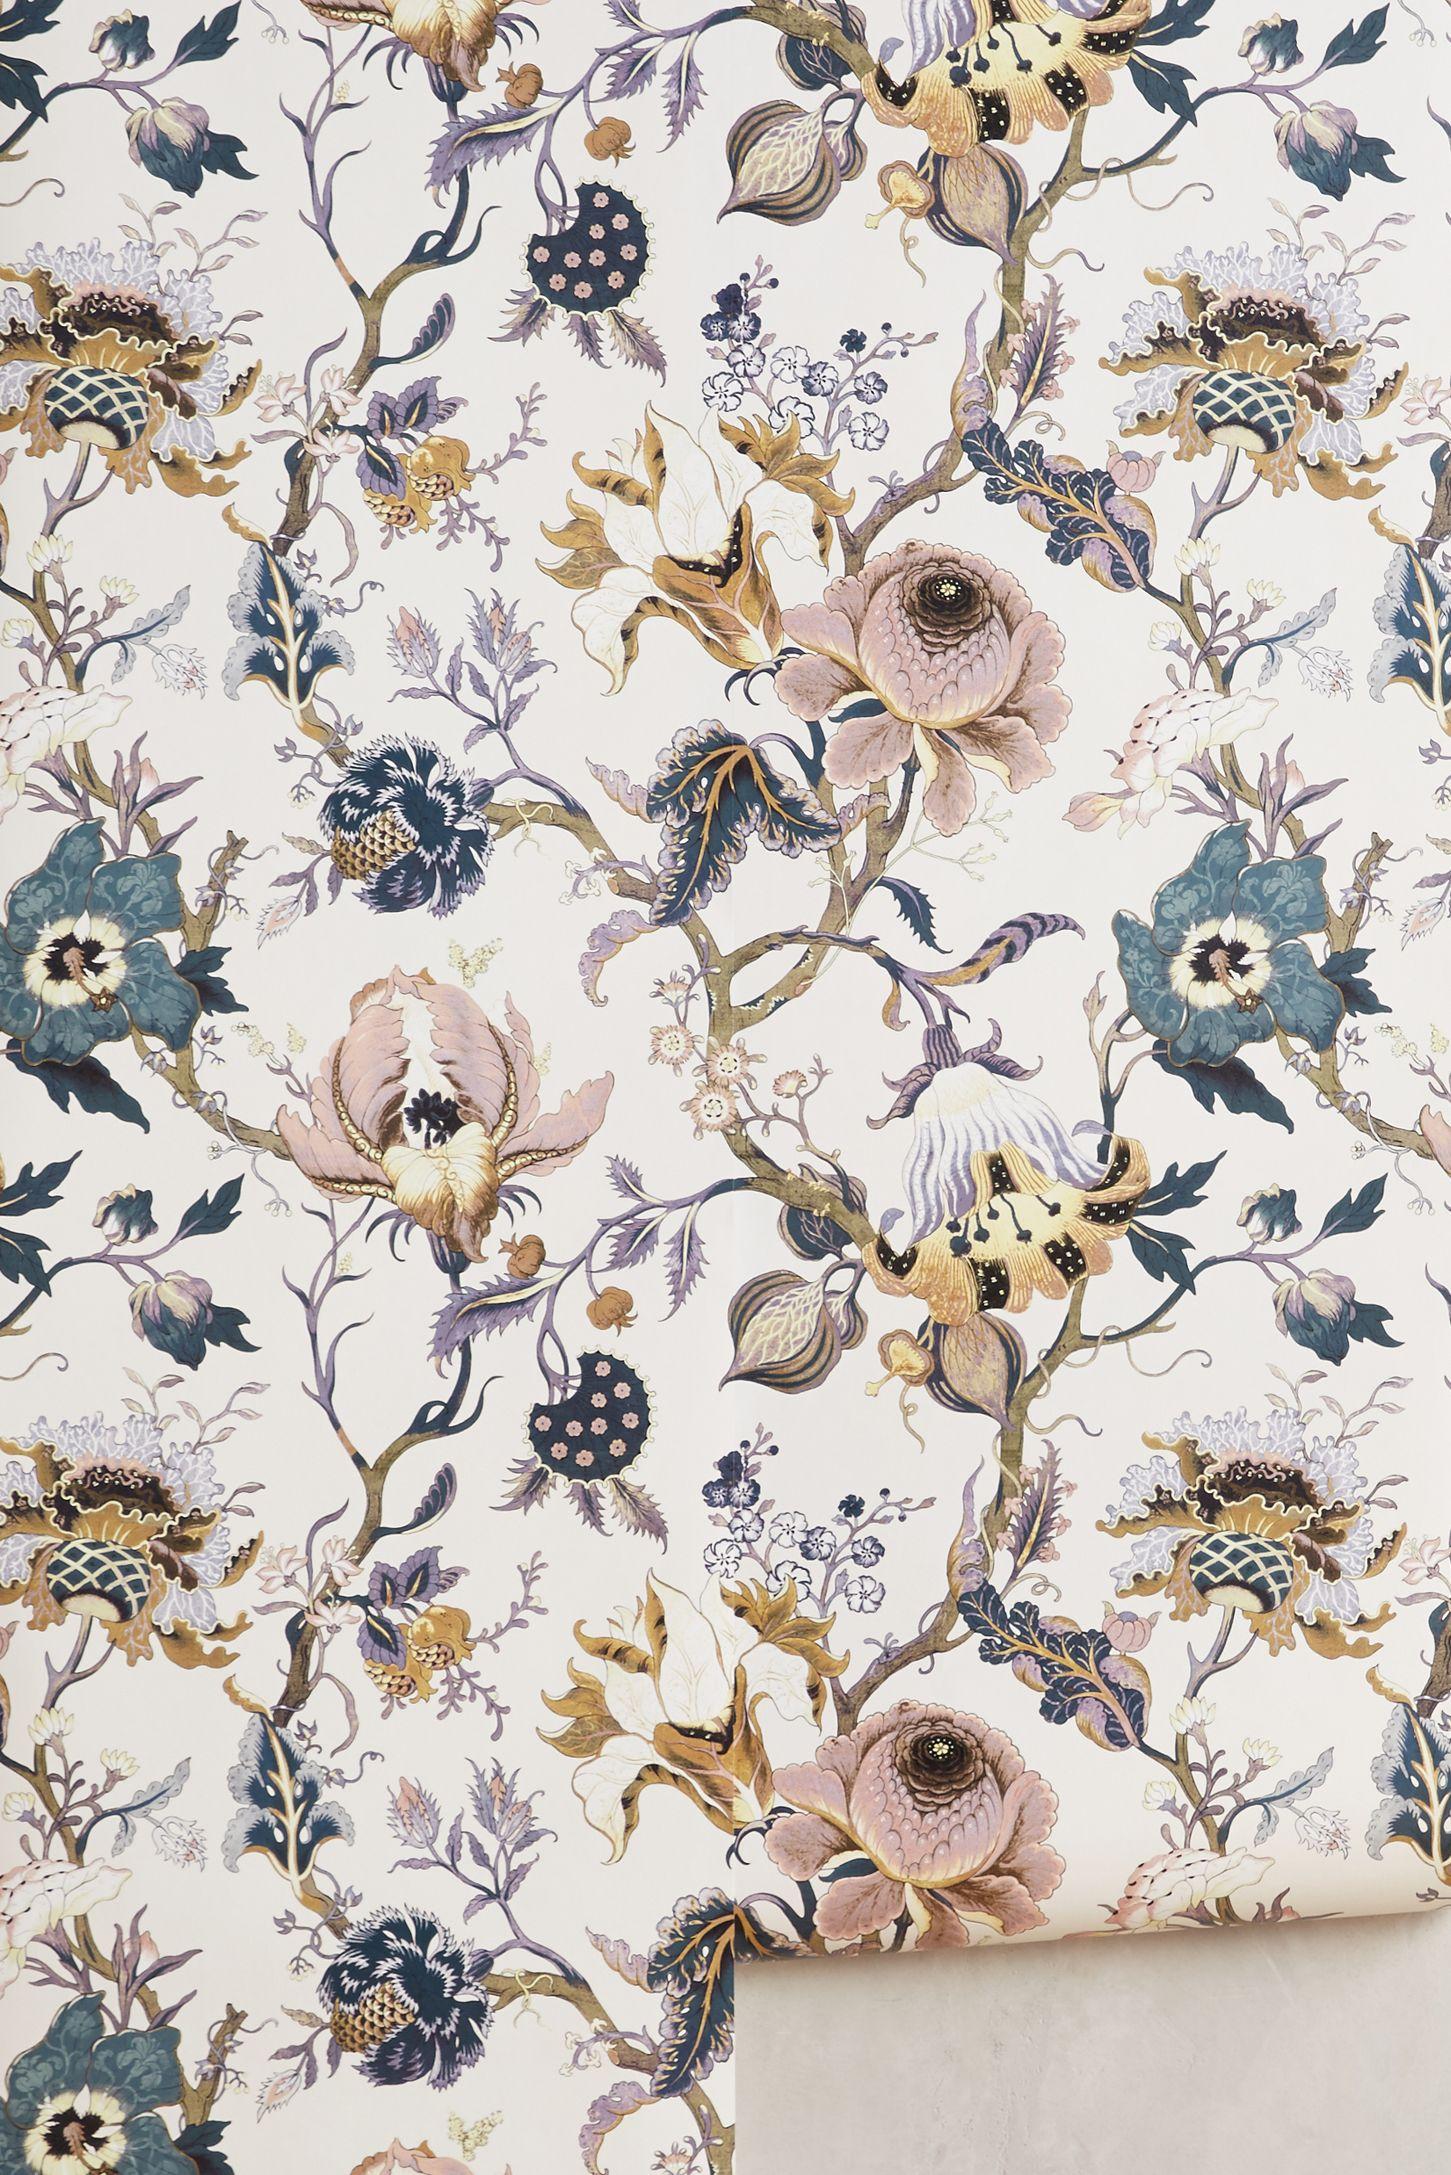 Vintage kitchen wallpaper patterns - Artemis Wallpaper